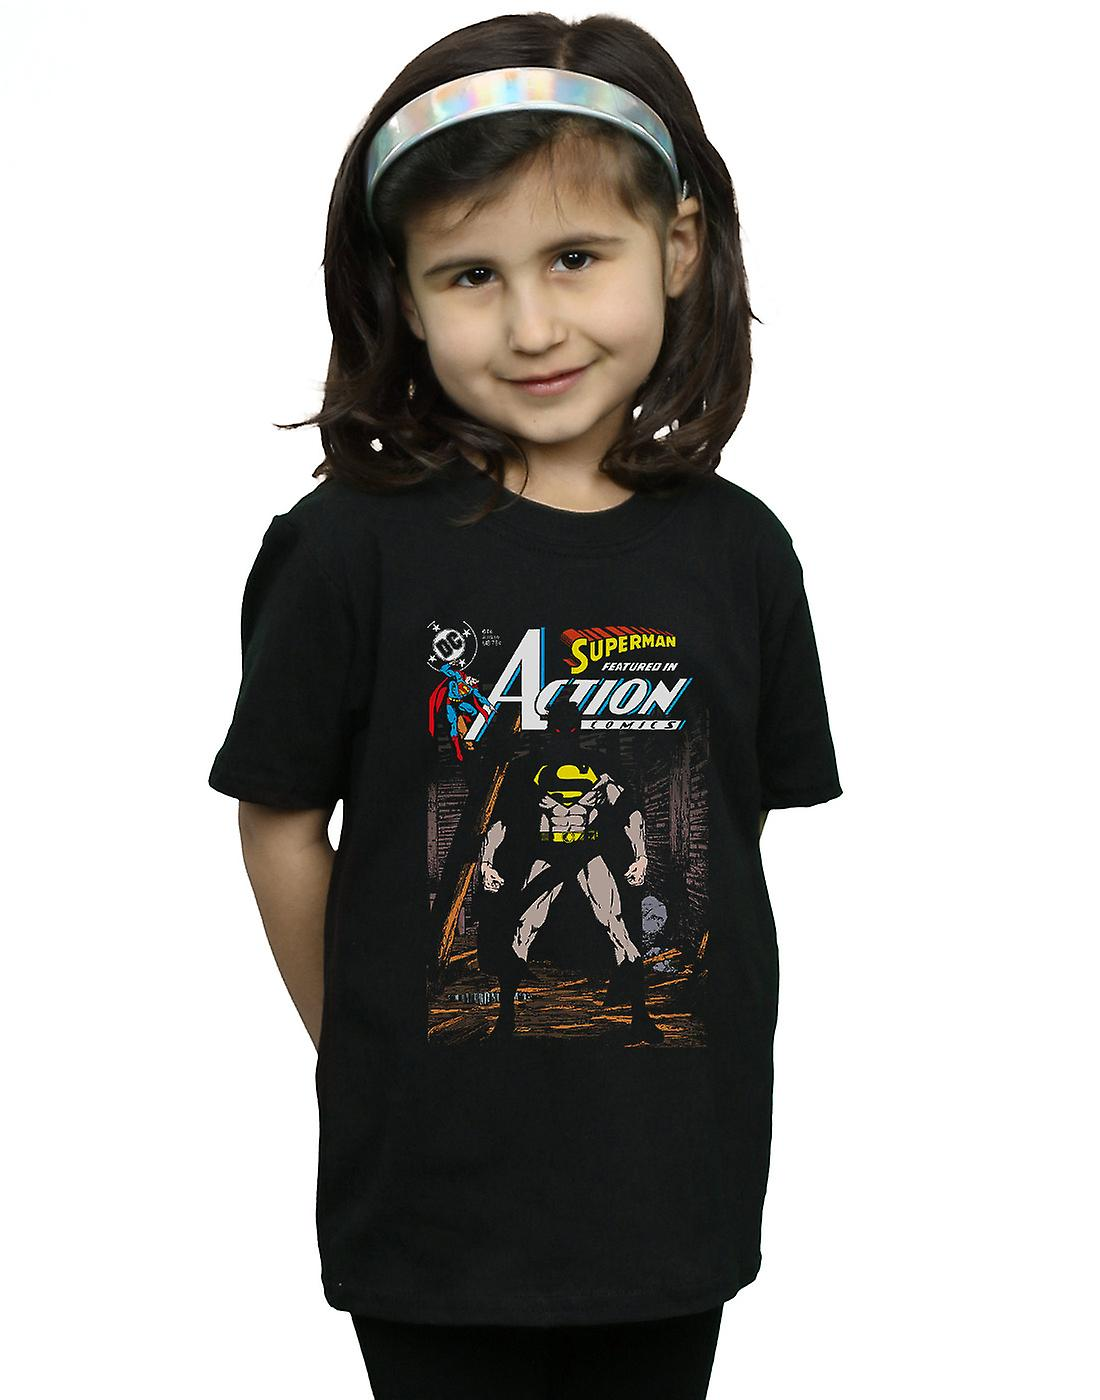 DC Comics Girls Superman Action Comics 644 Cover T-Shirt